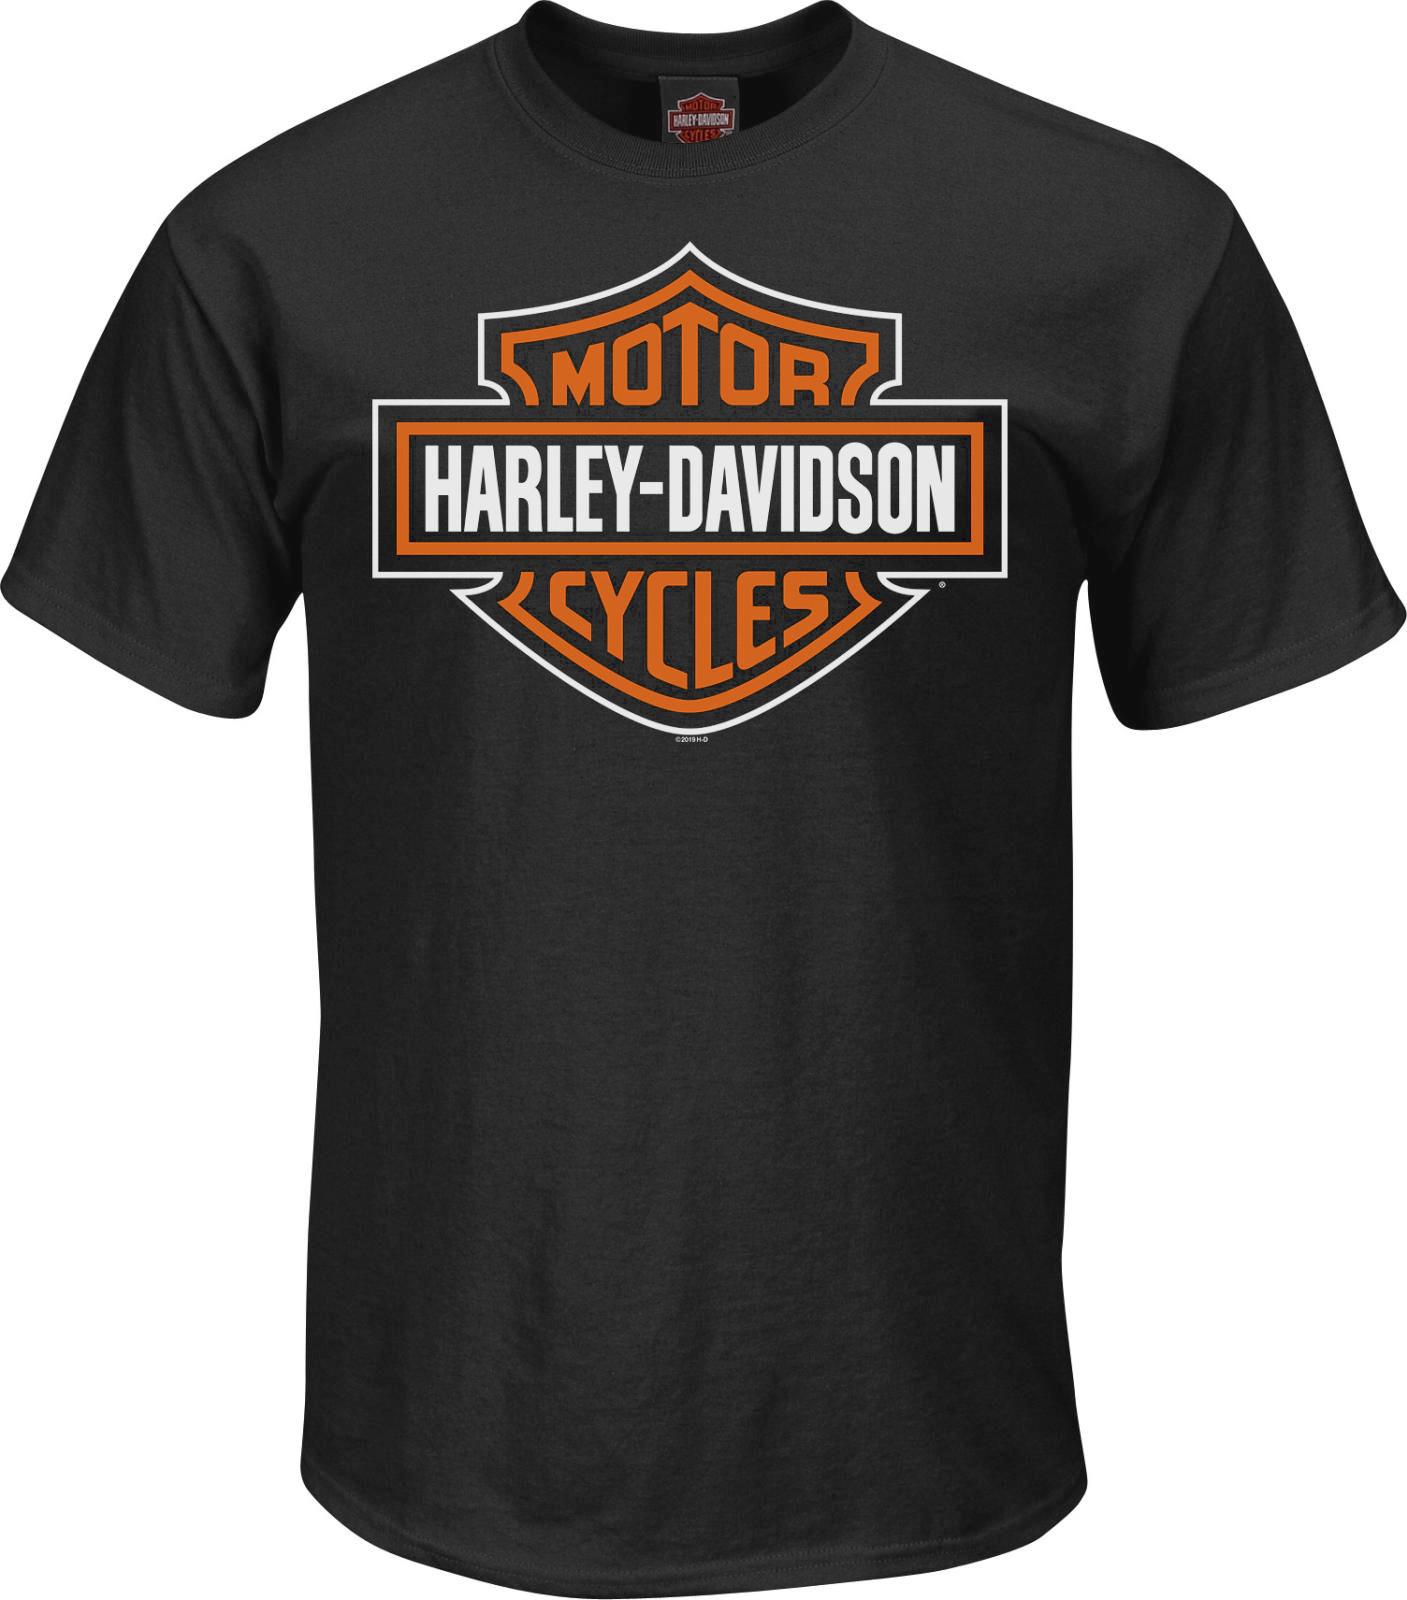 Harley Davidson Shield Logo T-Shirt Men S-XL Brand New!